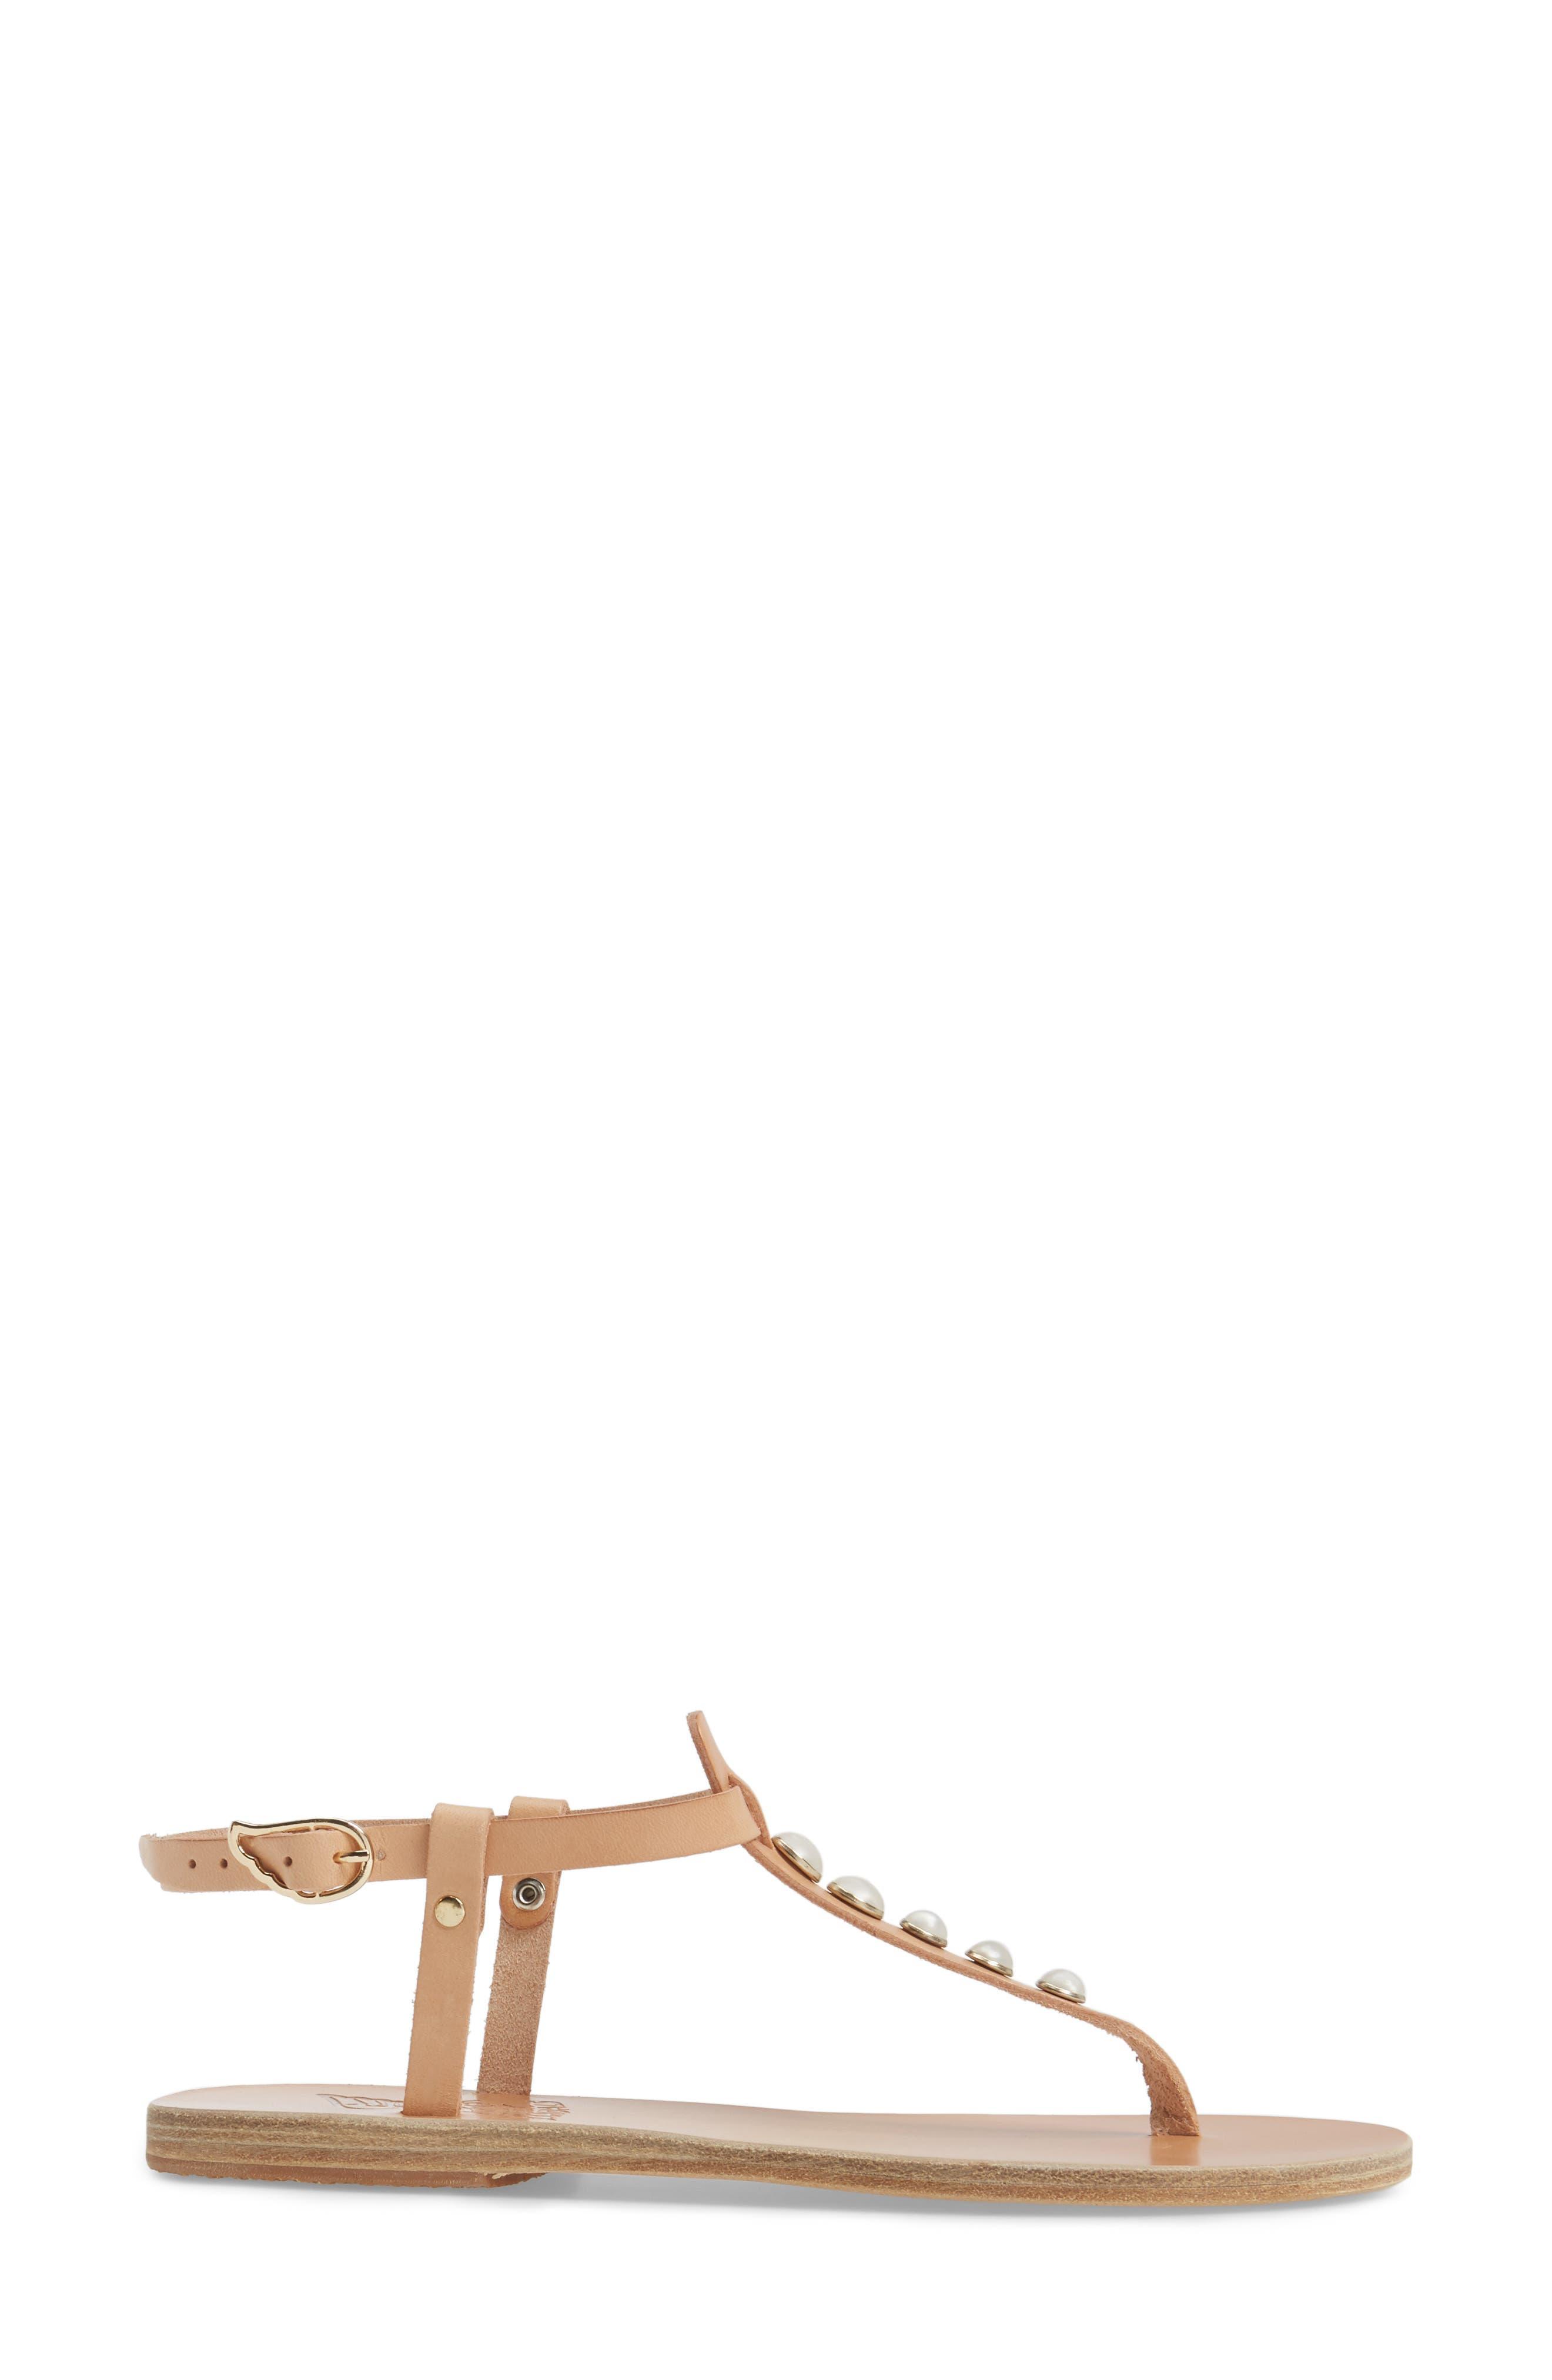 Lito Imitation Pearl Embellished T-Strap Sandal,                             Alternate thumbnail 3, color,                             Natural Vachetta